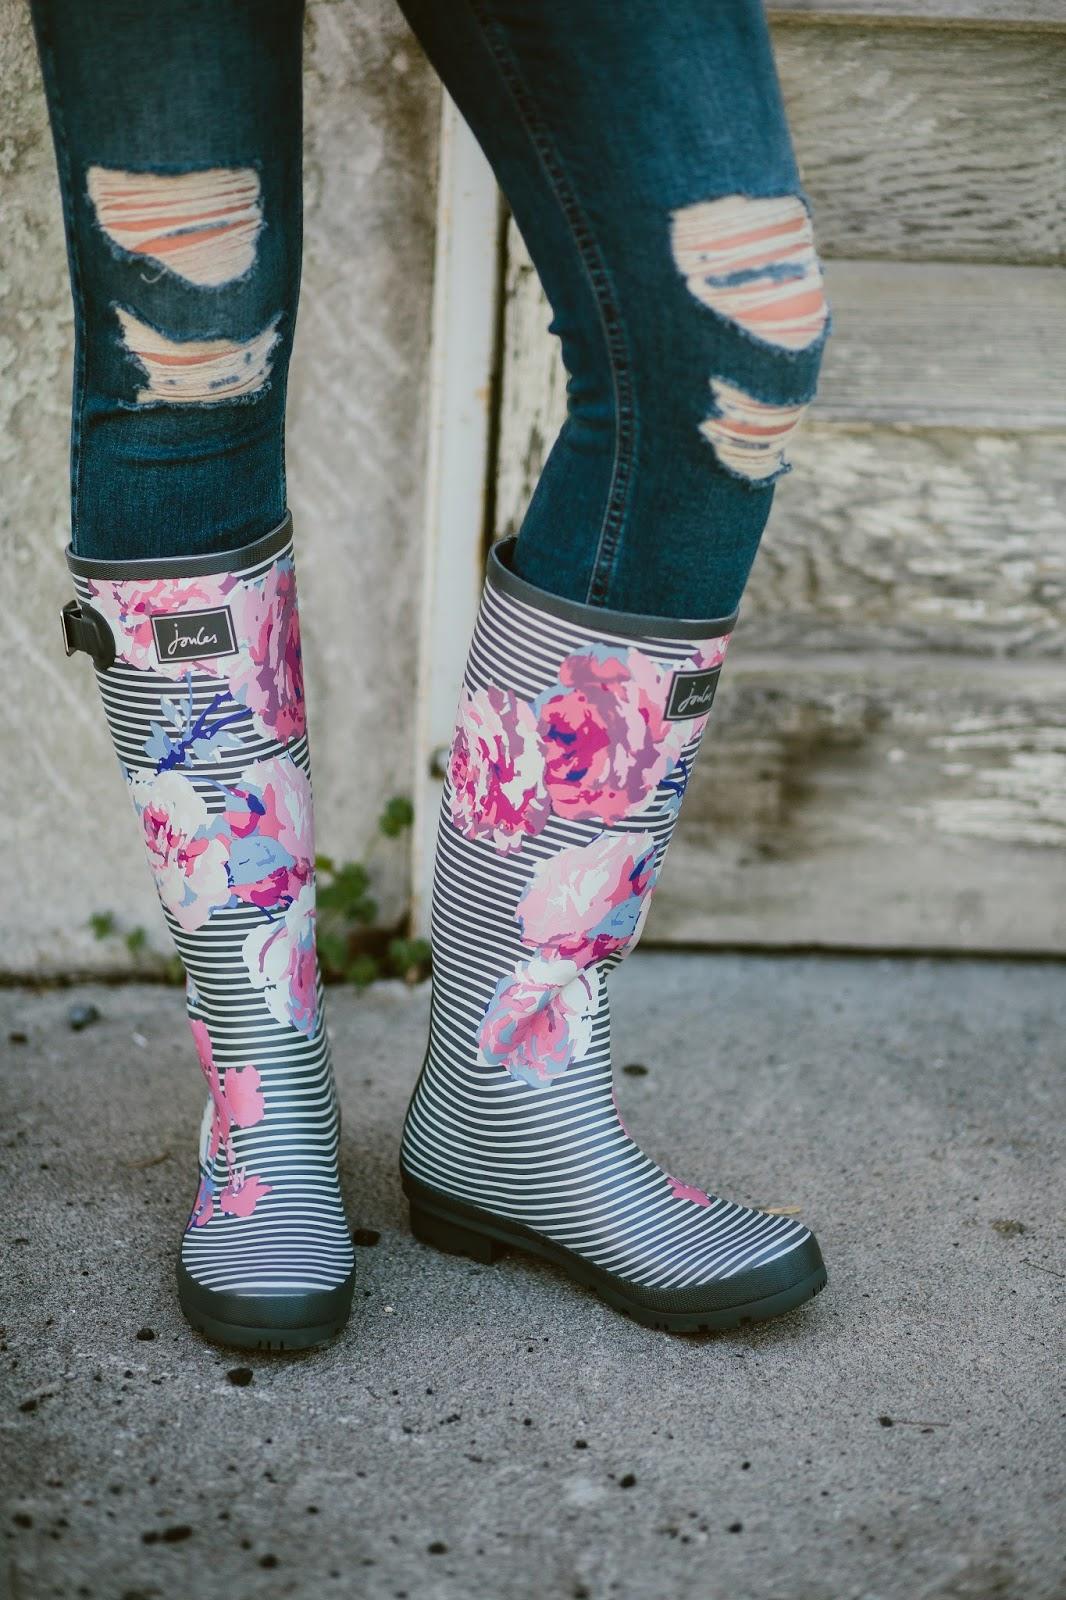 Floral Rain Boots, Rain boots, Joules Rain Boots